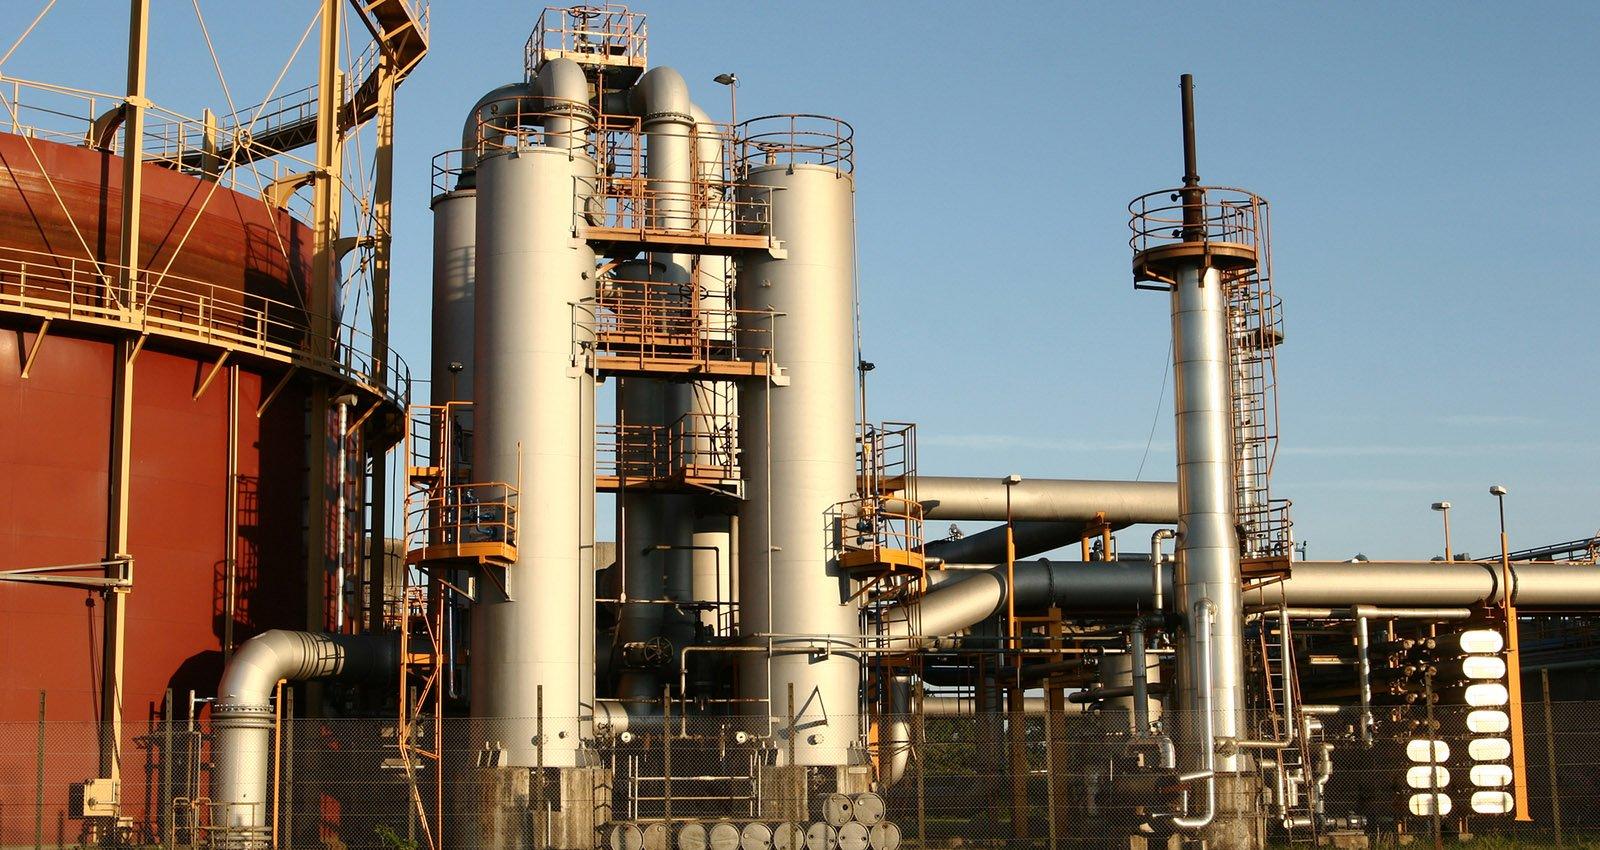 Opec erhöht Öl-Förderquote um 400.000 Barrel im Monat